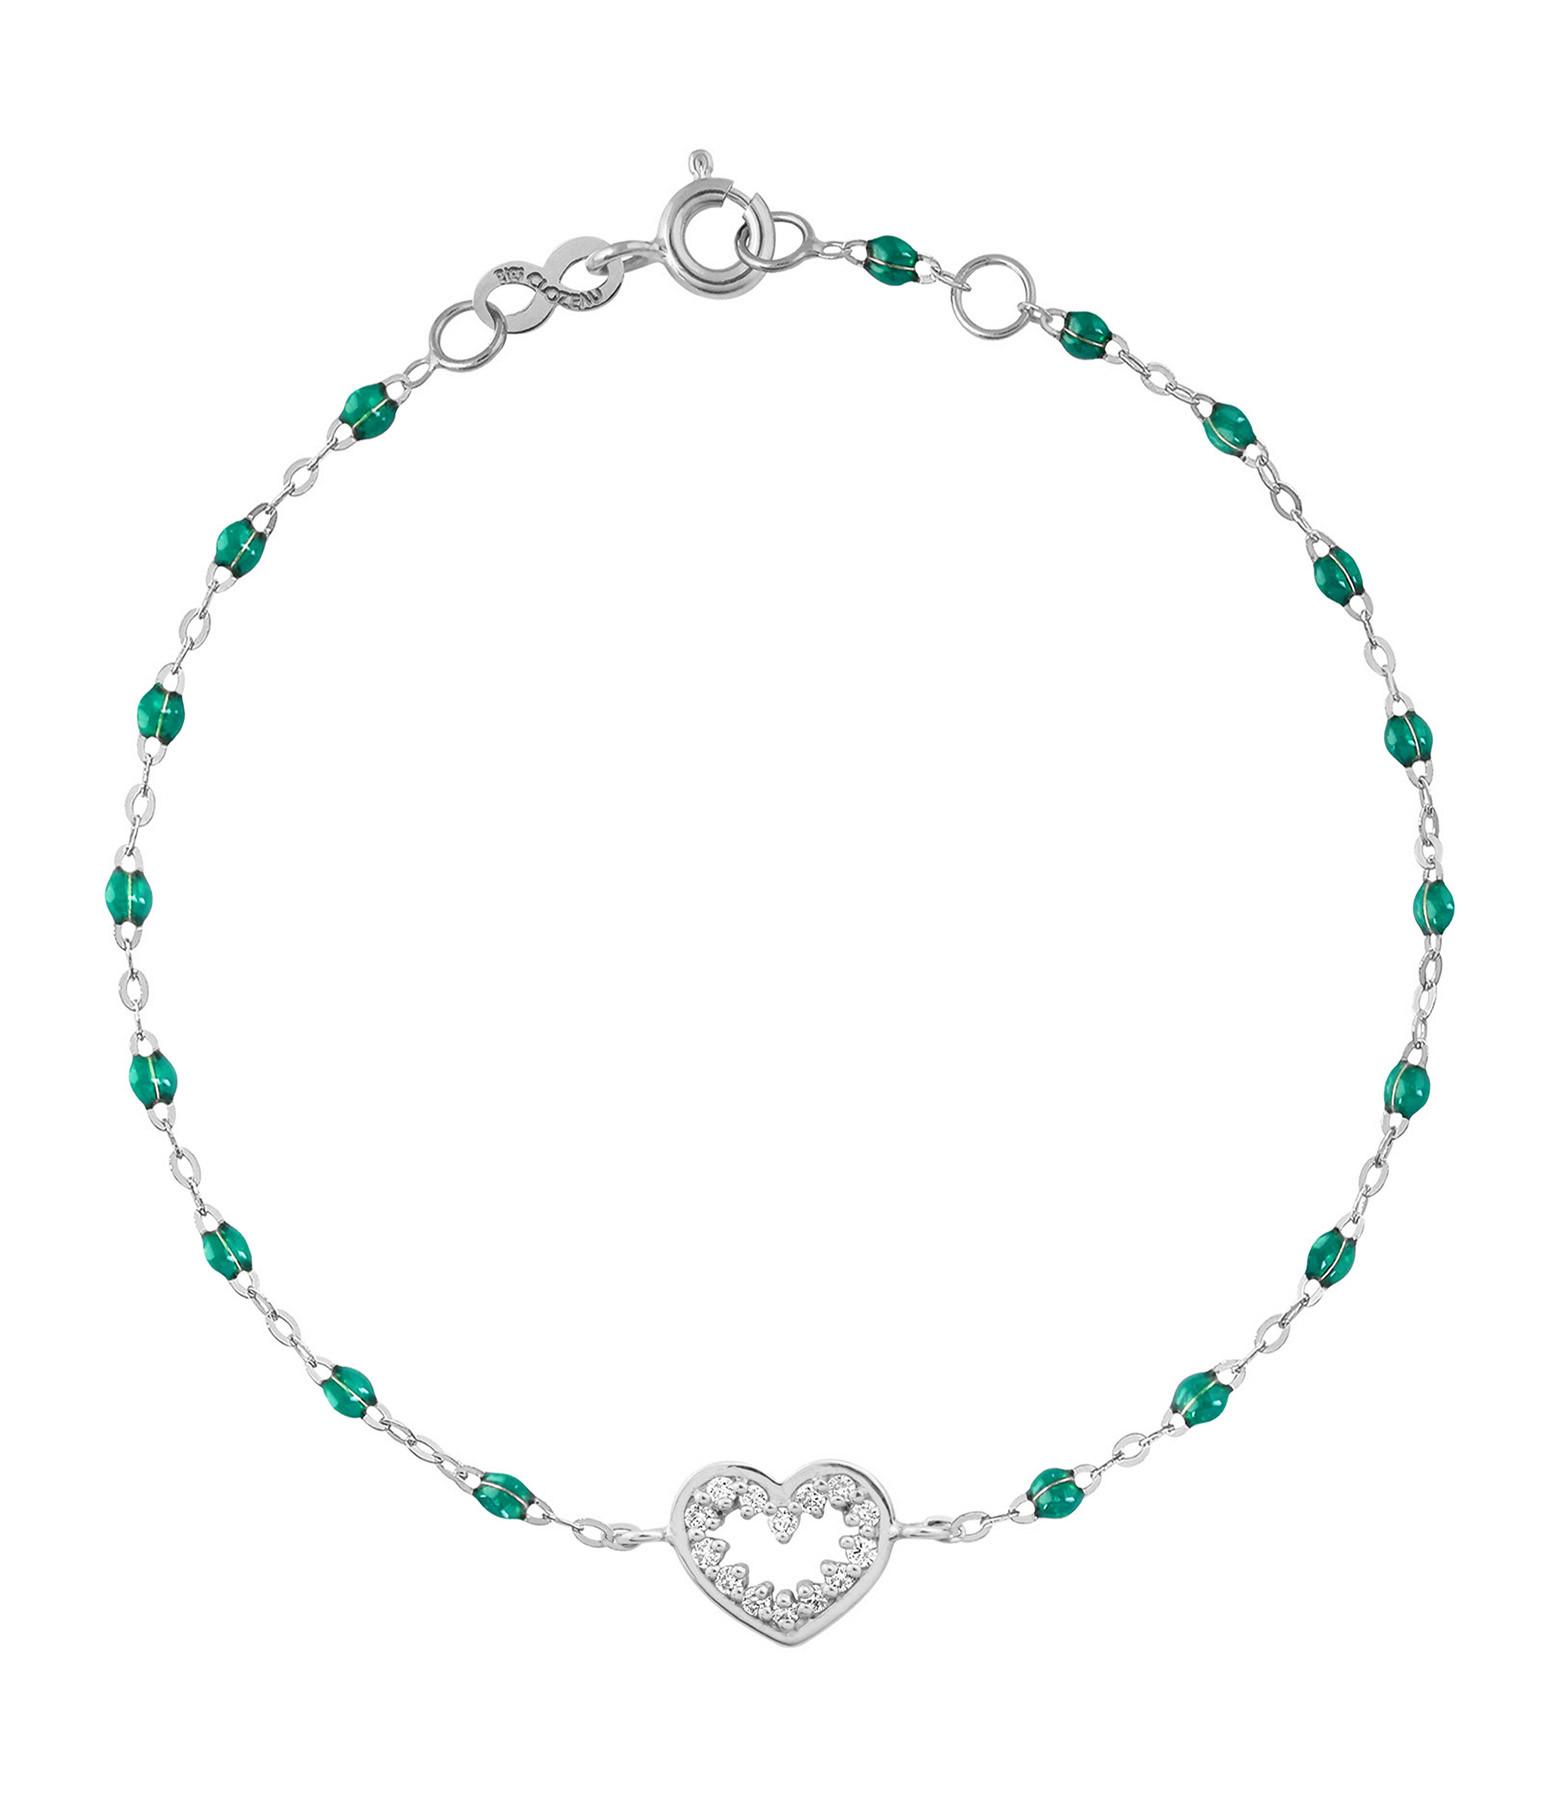 GIGI CLOZEAU - Bracelet Résine CŒur Suprême Diams OG